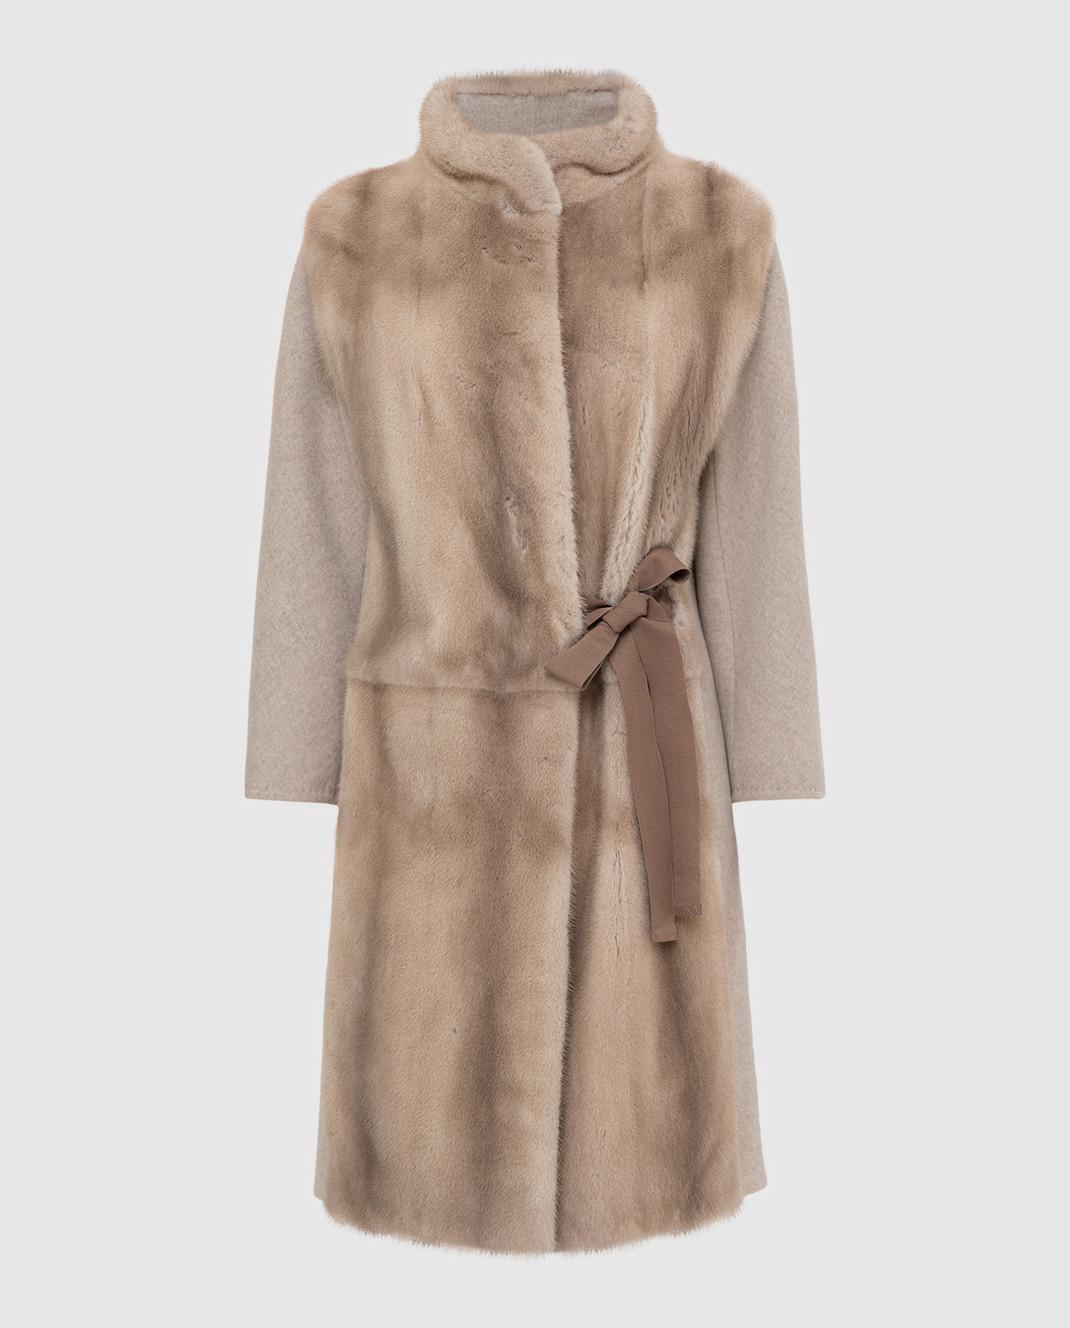 Giuliana Teso Бежевое пальто из шерсти с мехом норки 74QS285T072